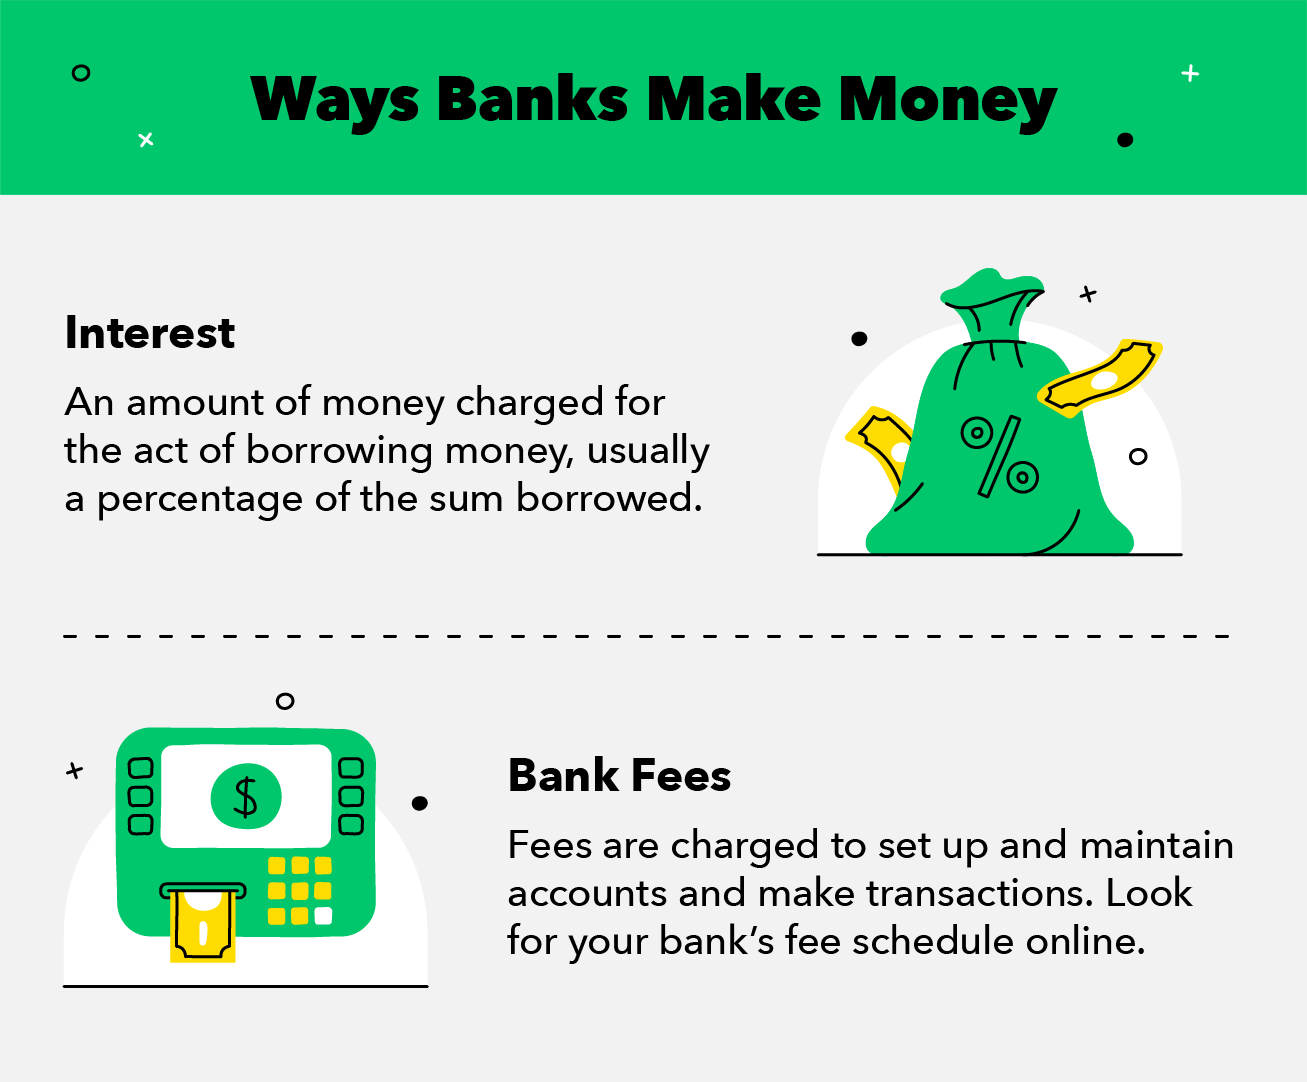 ways-banks-make-money copy 2